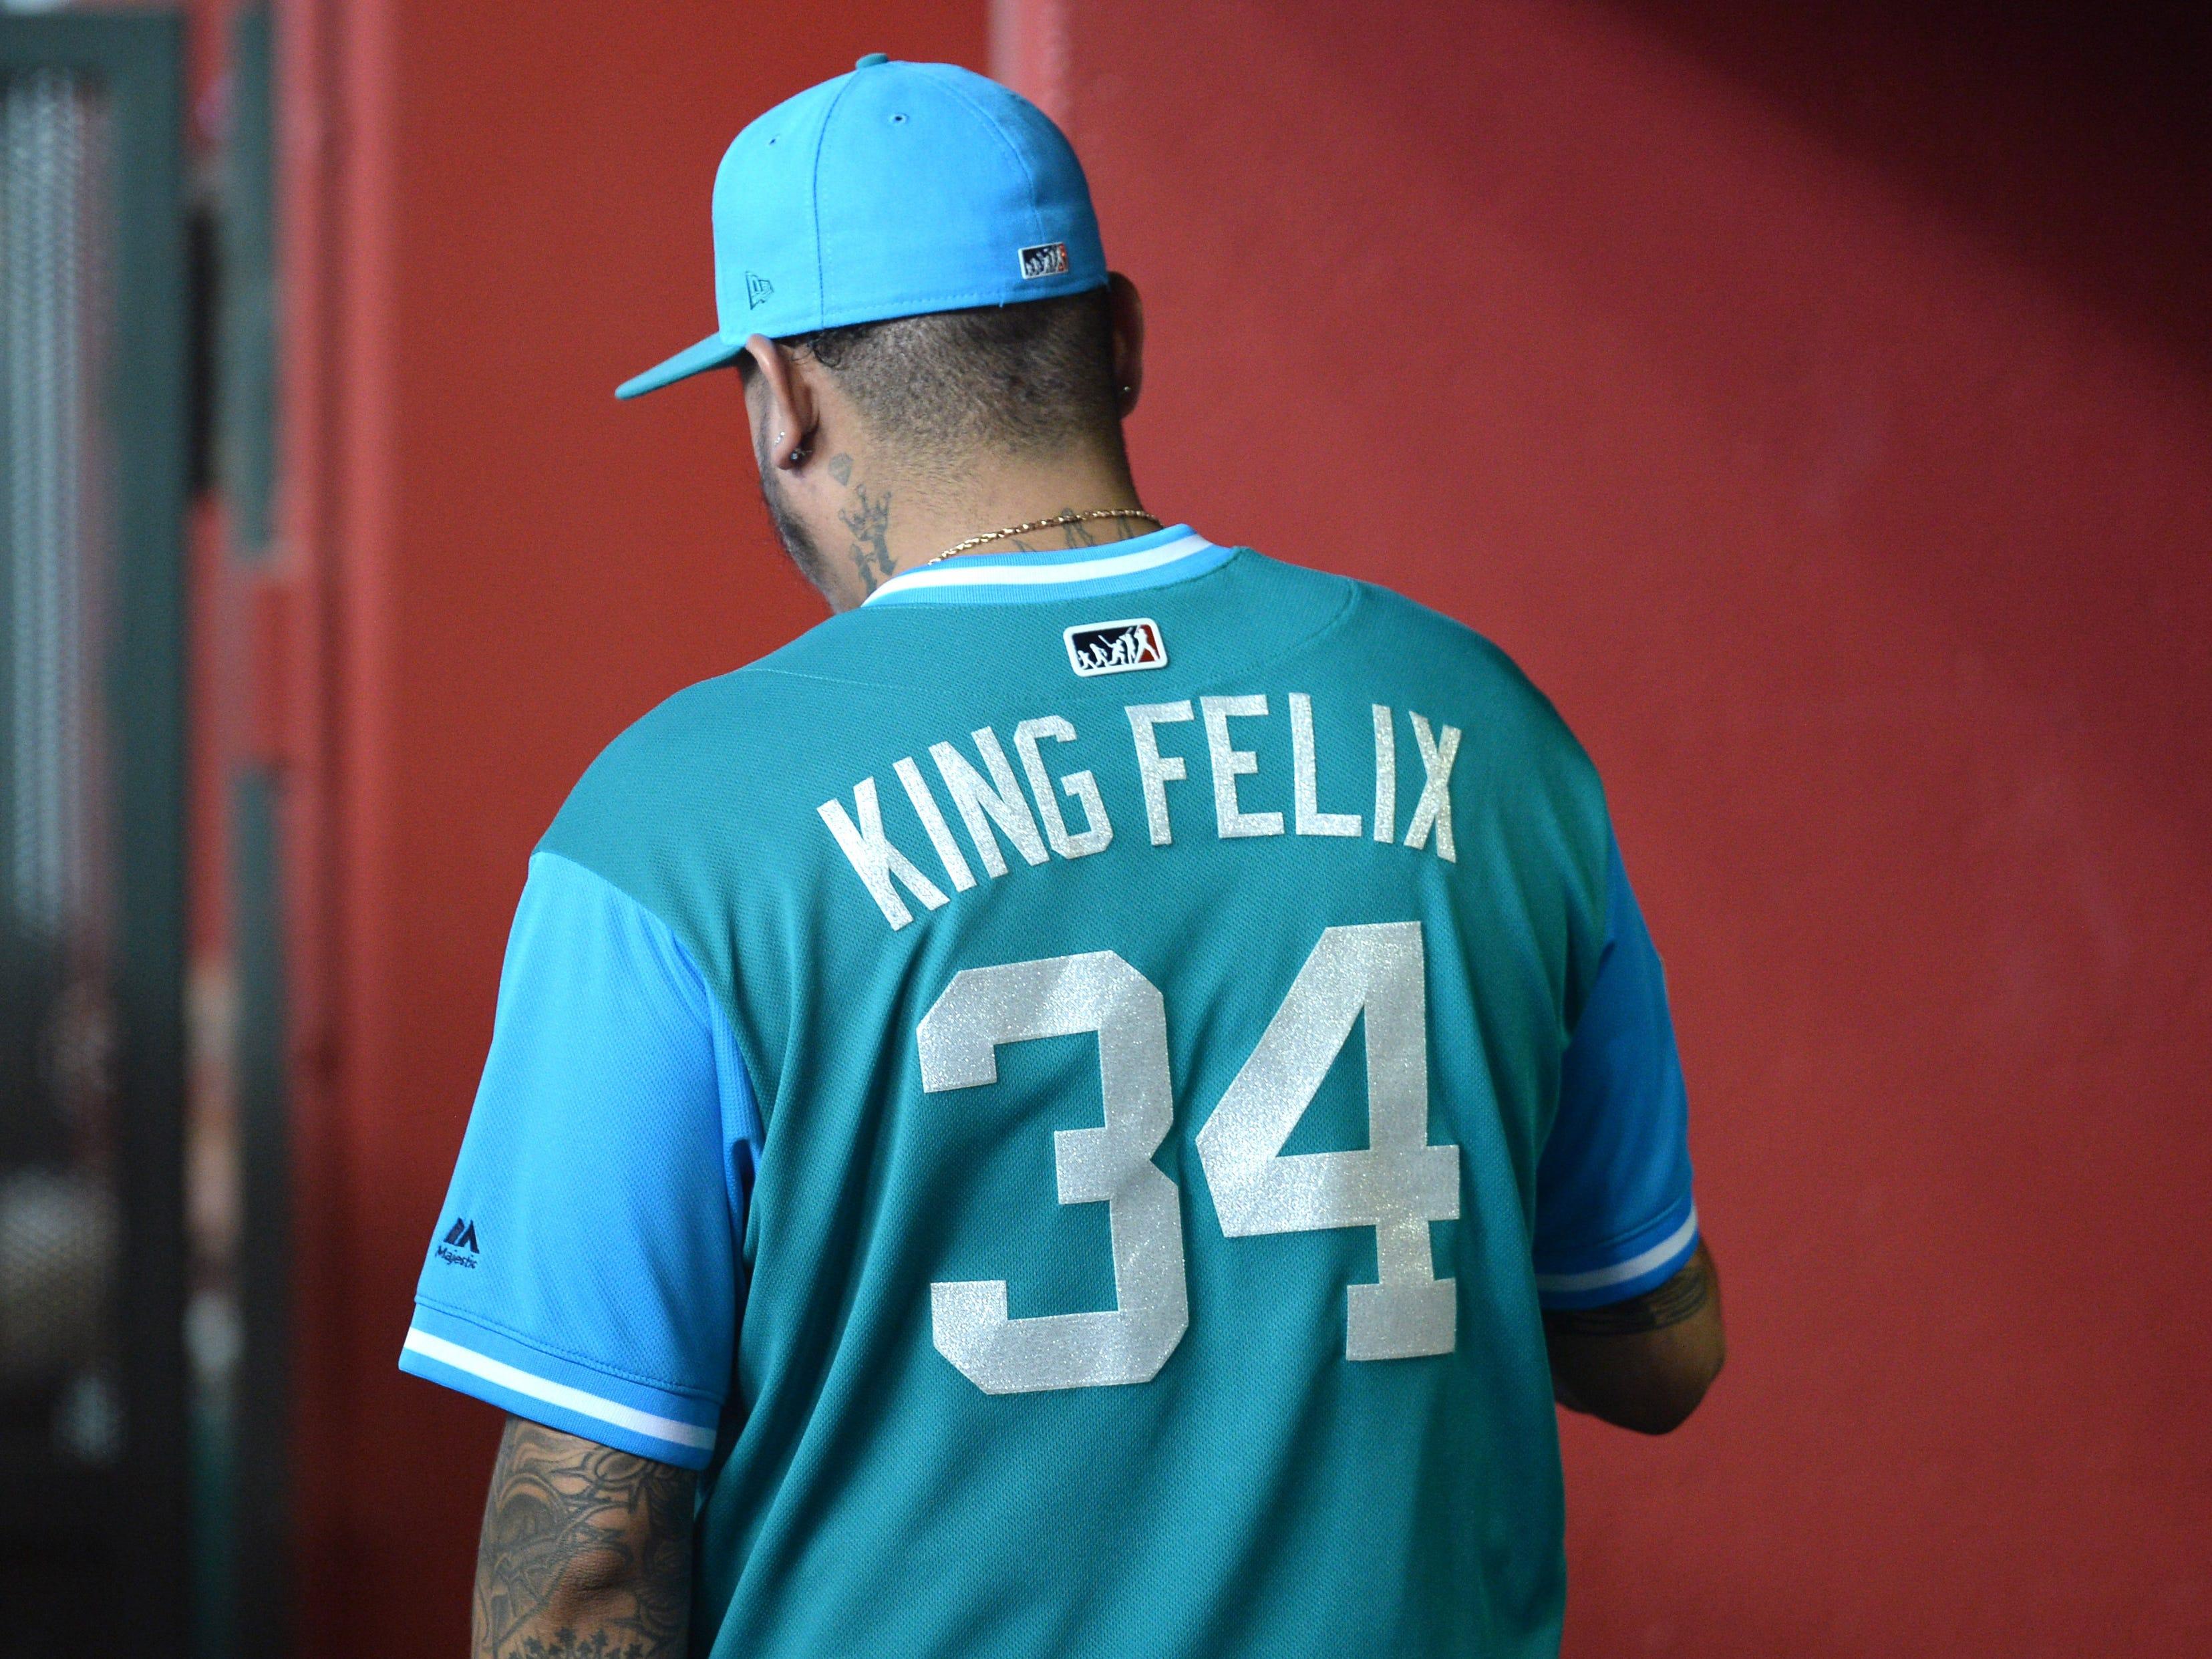 Aug 25, 2018; Phoenix, AZ, USA; Seattle Mariners starting pitcher Felix Hernandez (34) walks the dugout during the first inning against the Arizona Diamondbacks at Chase Field. Mandatory Credit: Joe Camporeale-USA TODAY Sports